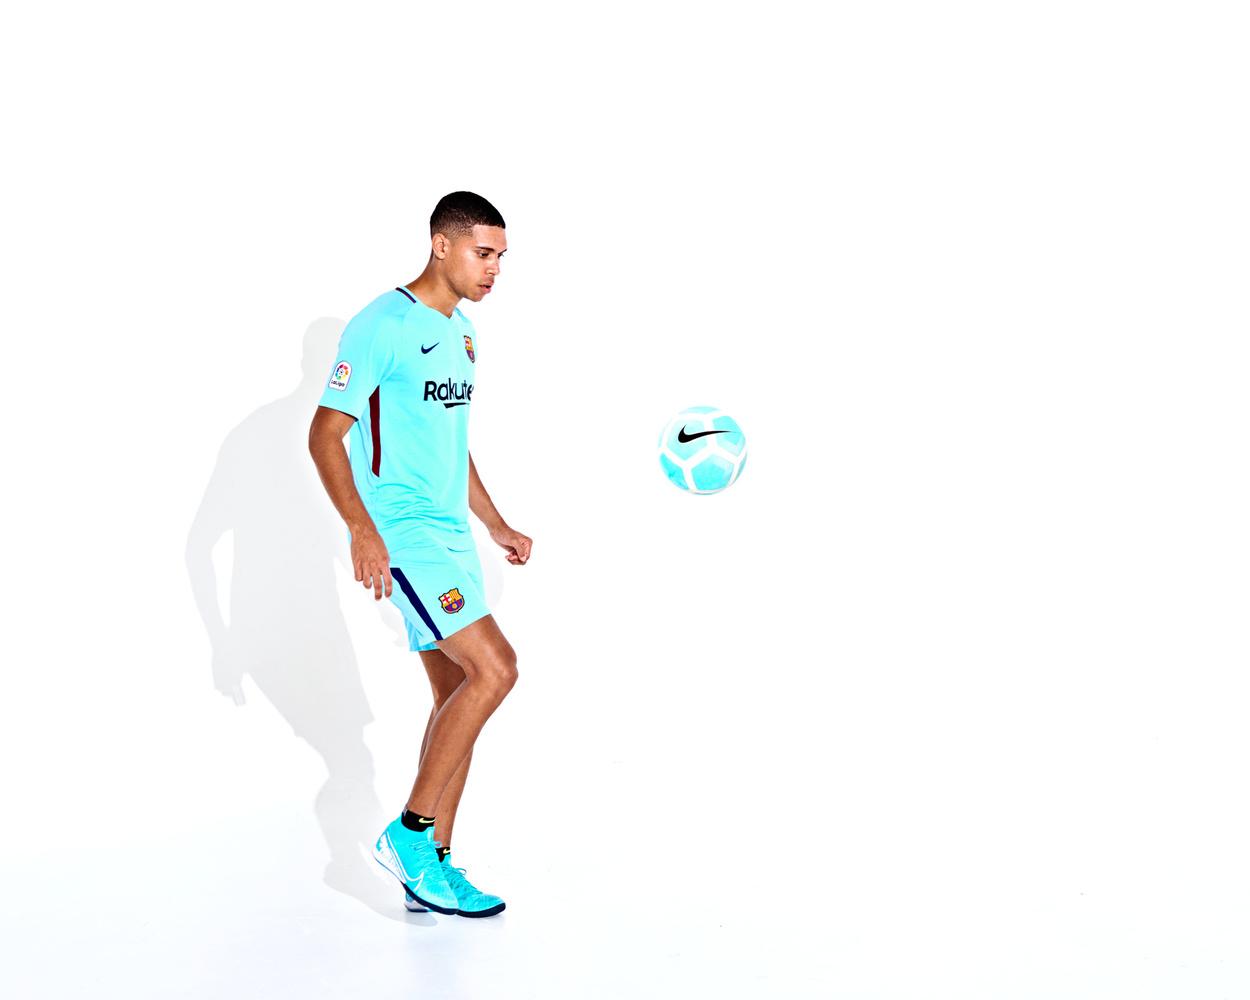 Anthony Soccer by jason hill